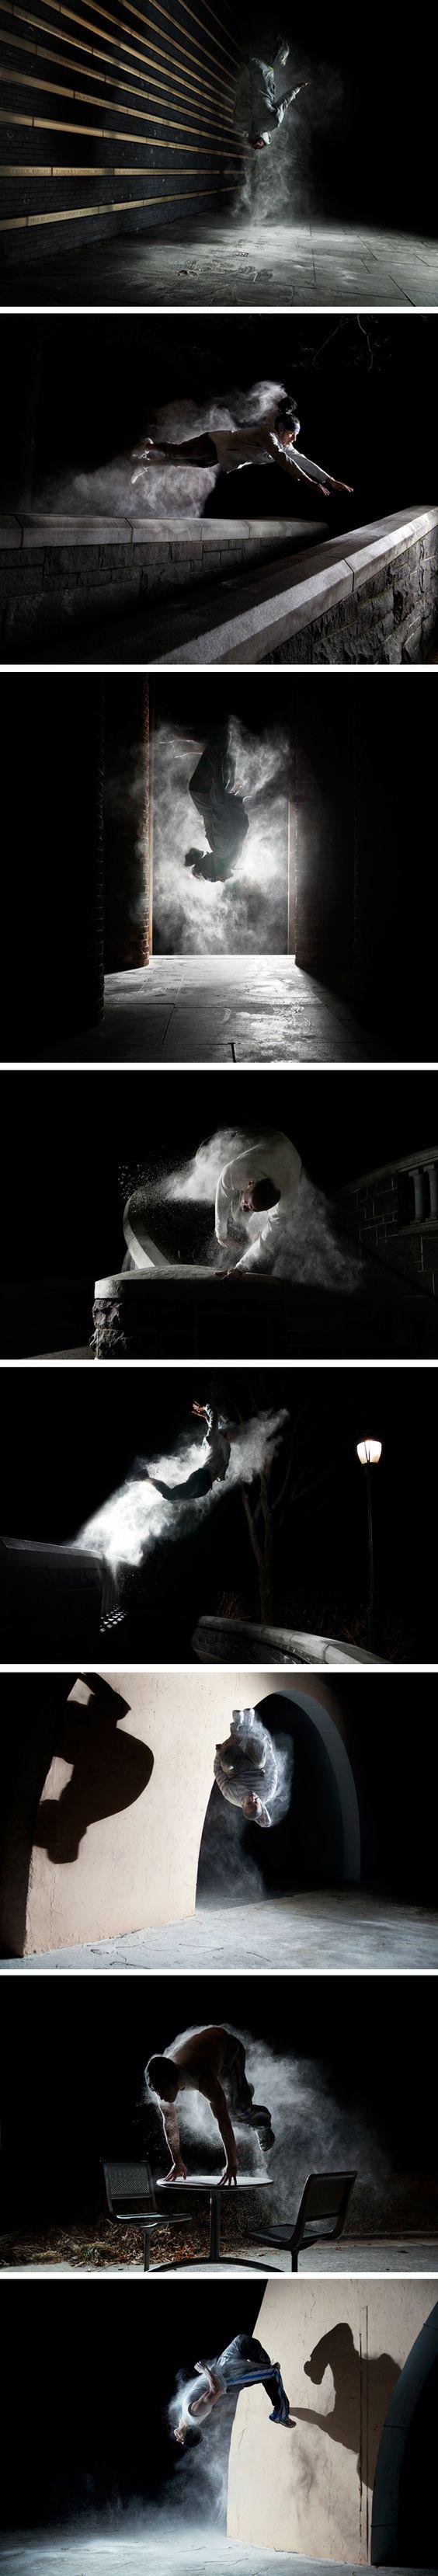 Parkour Motion par Ben Franke #photo #parkour #awesome